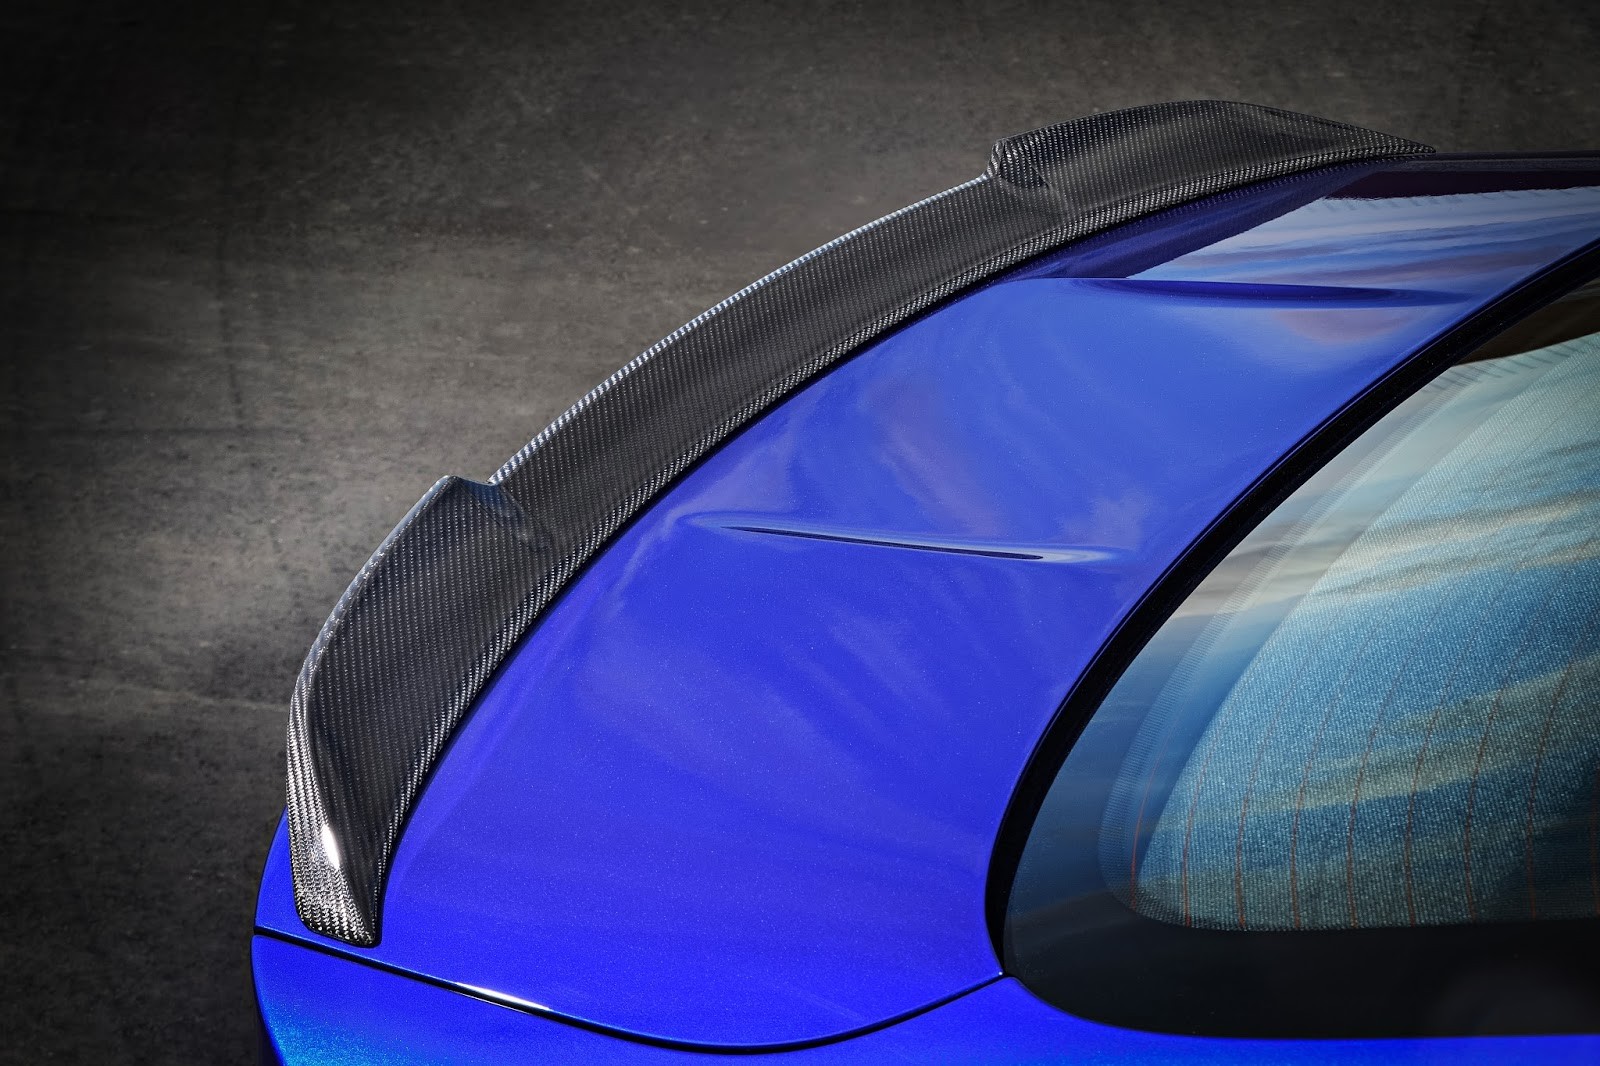 P90251055 highRes the new bmw m4 cs 04 Η περιορισμένης παραγωγής BMW M4 ClubSport δική σας με 116.900 ευρώ BMW, BMW M, BMW M4, BMW M4 CS, BMW Motorsport, clubsport, COUPE, Limited edition, supercars, supersport, videos, Περιορισμένης παραγωγής